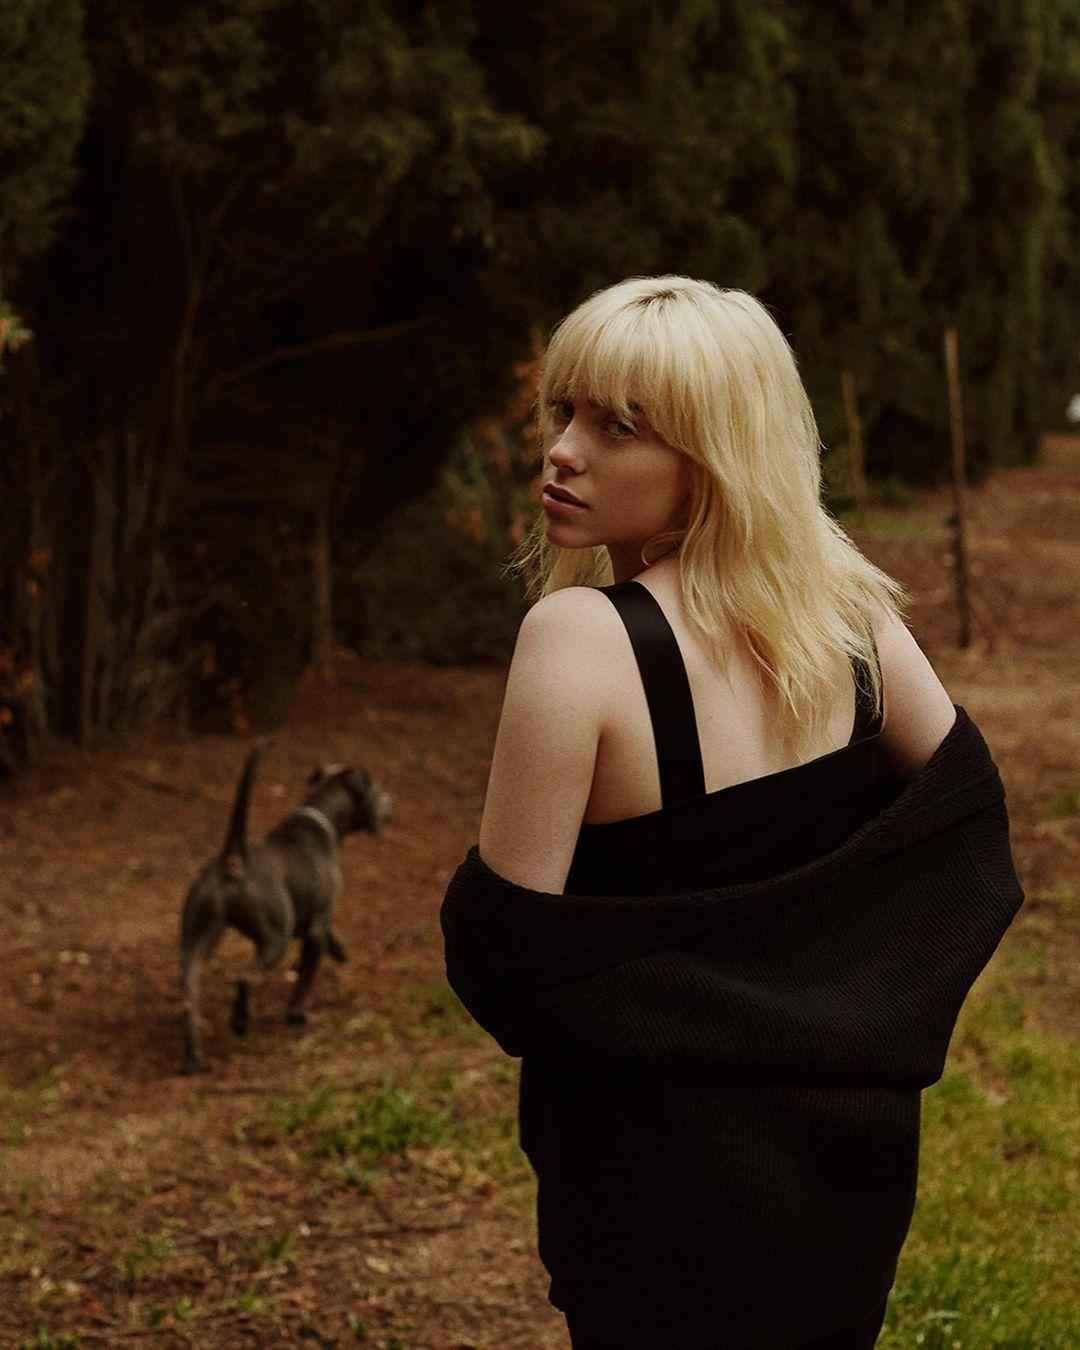 Украинка Яна Яцюк сняла Билли Айлиш для обложки Rolling Stone